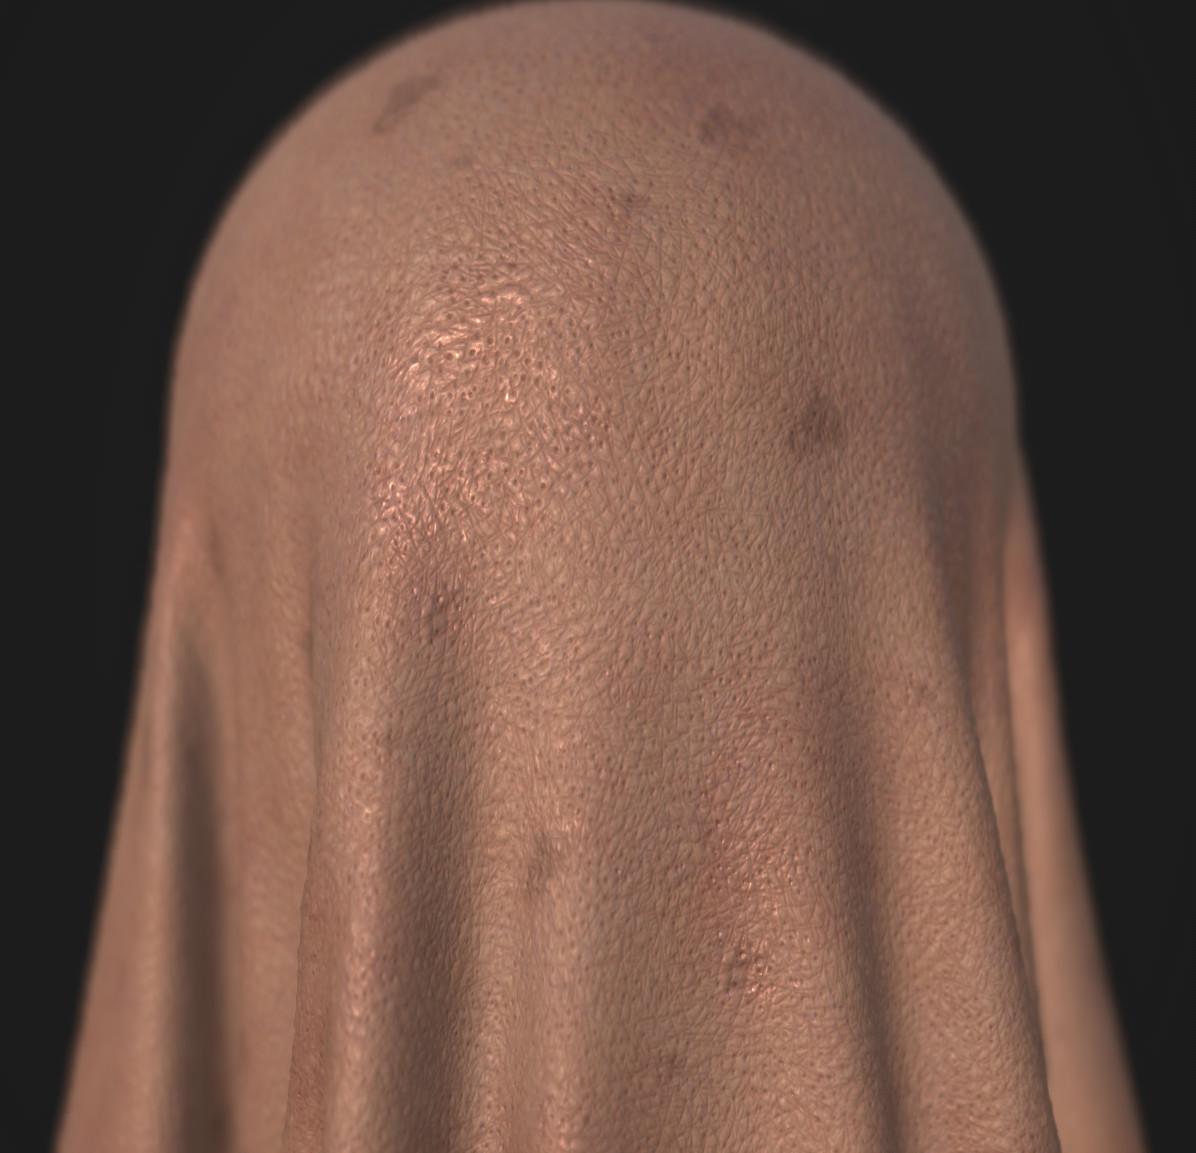 Is this Pig skin ?